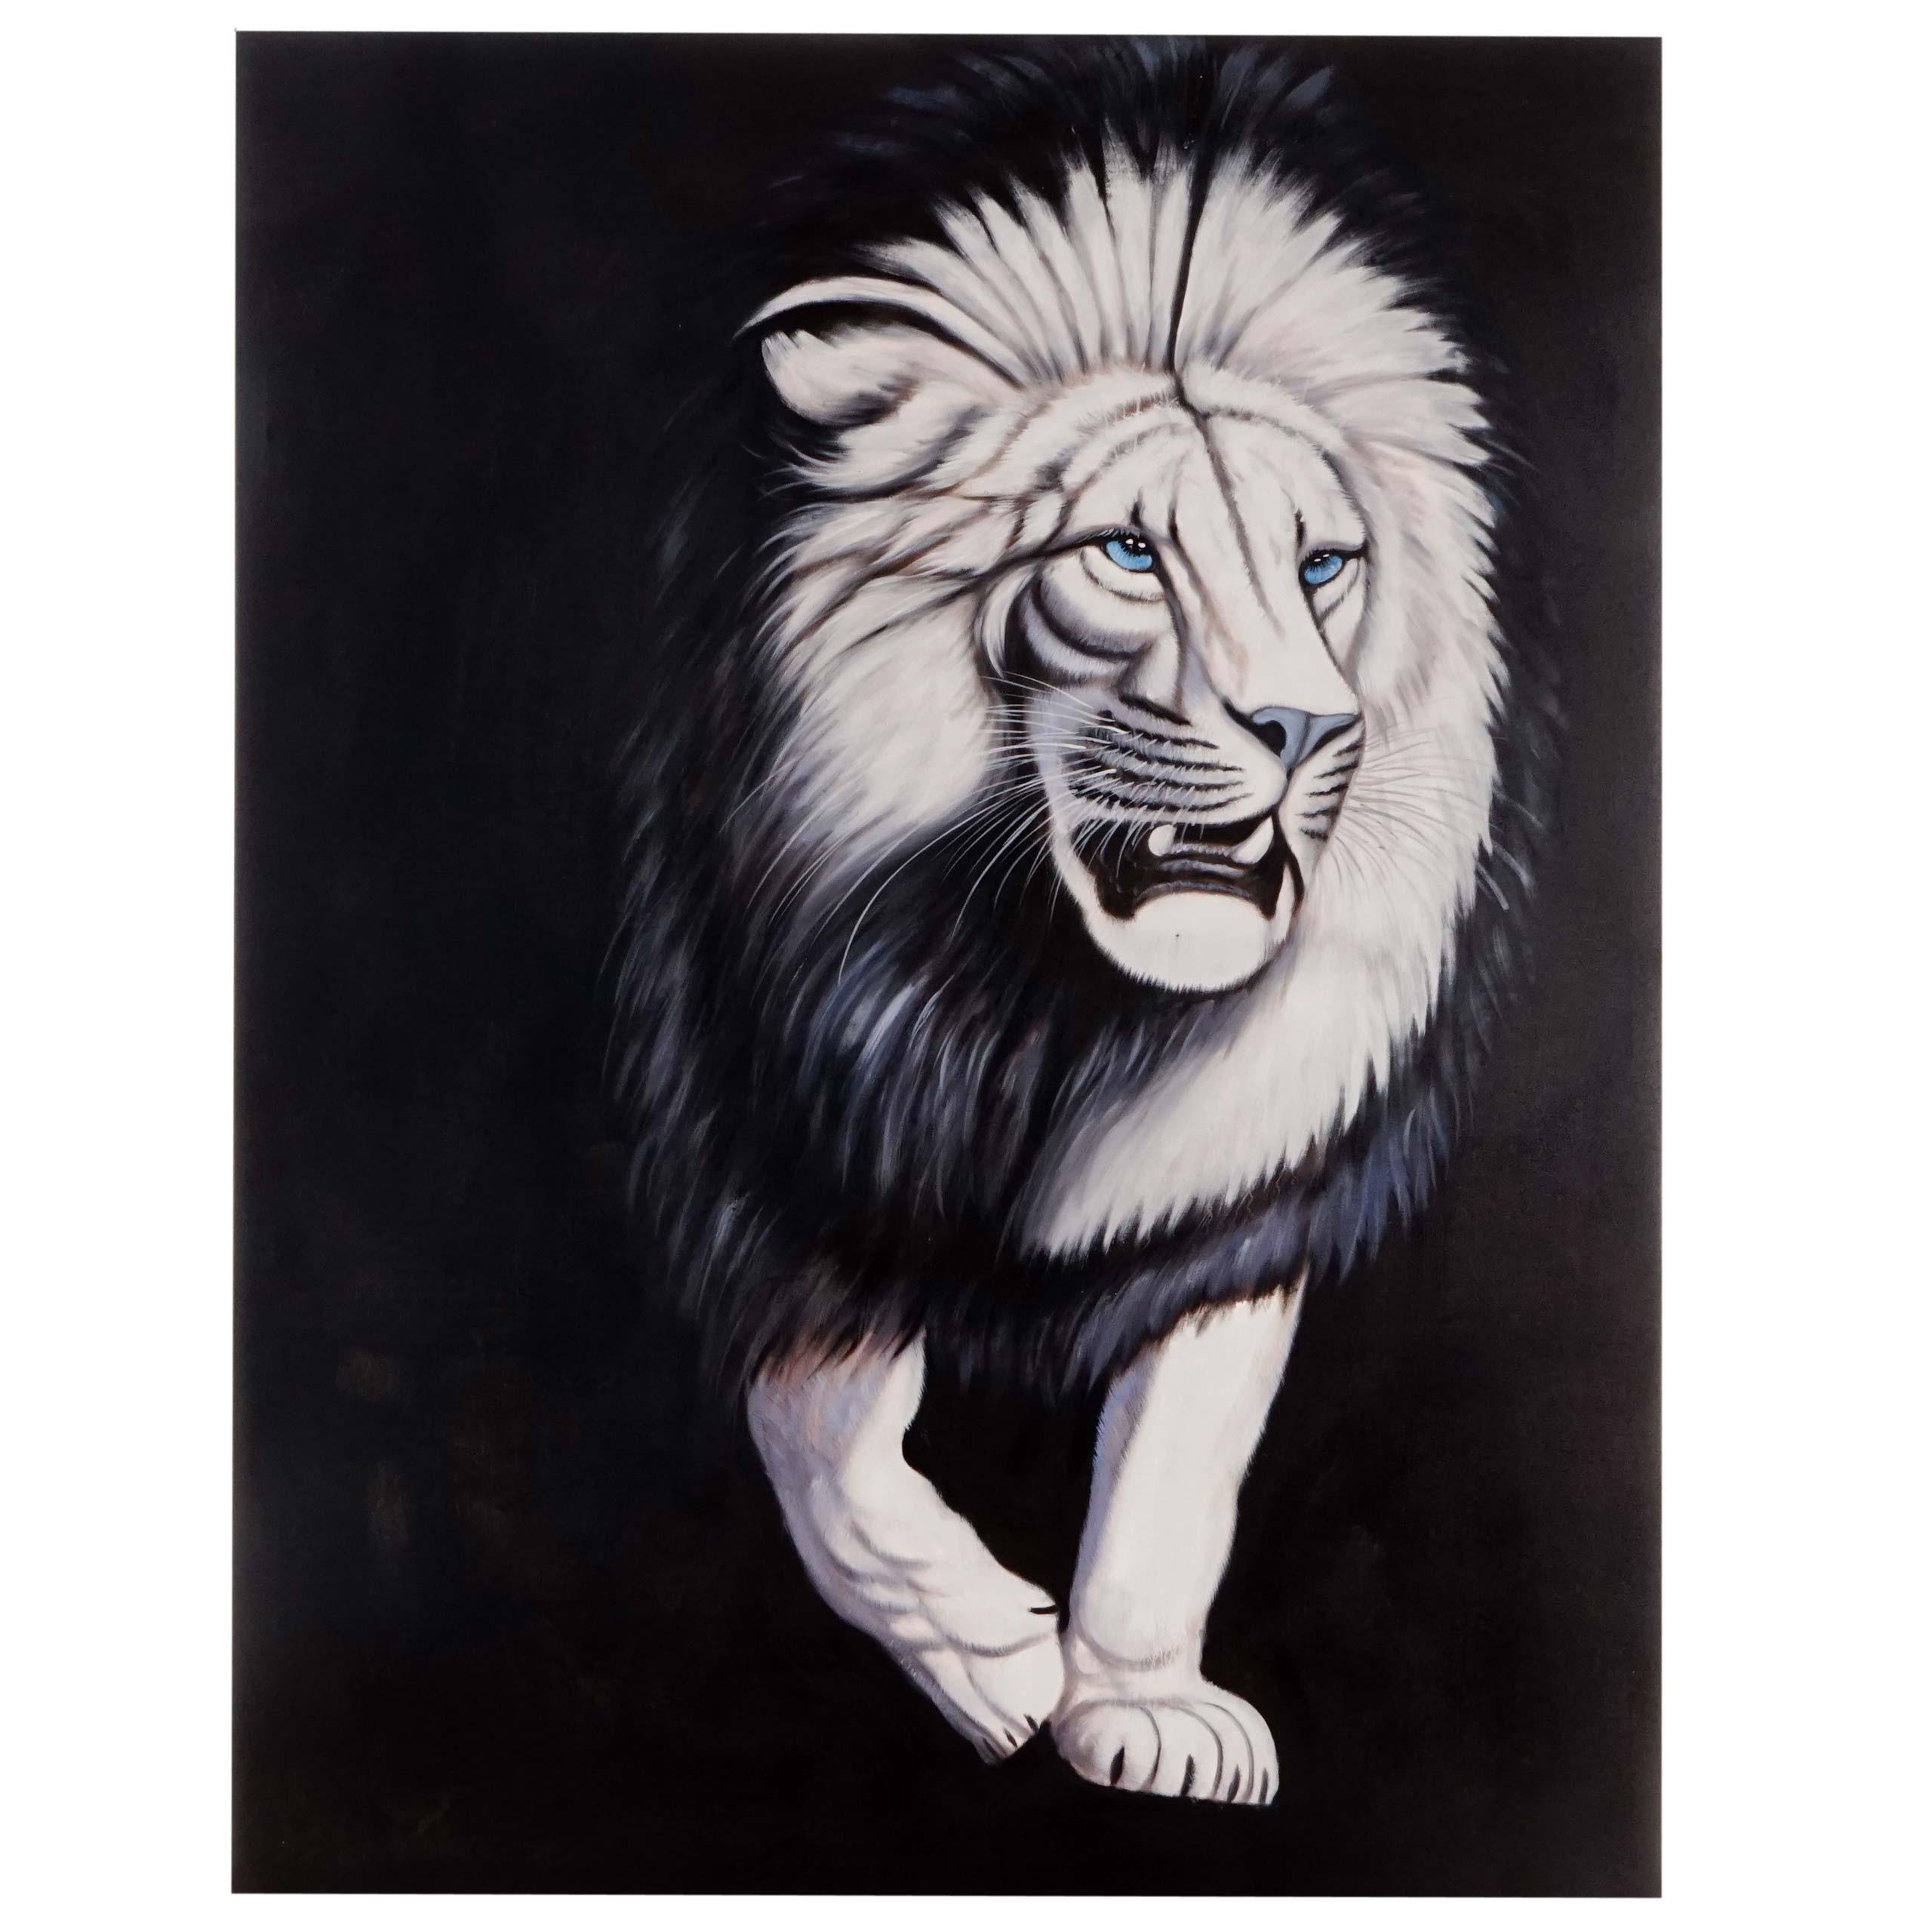 Mendler Ölgemälde Weißer Löwe, 100% handgemaltes Wandbild Gemälde XL, 120x90cm ~ Variantenangebot 44743